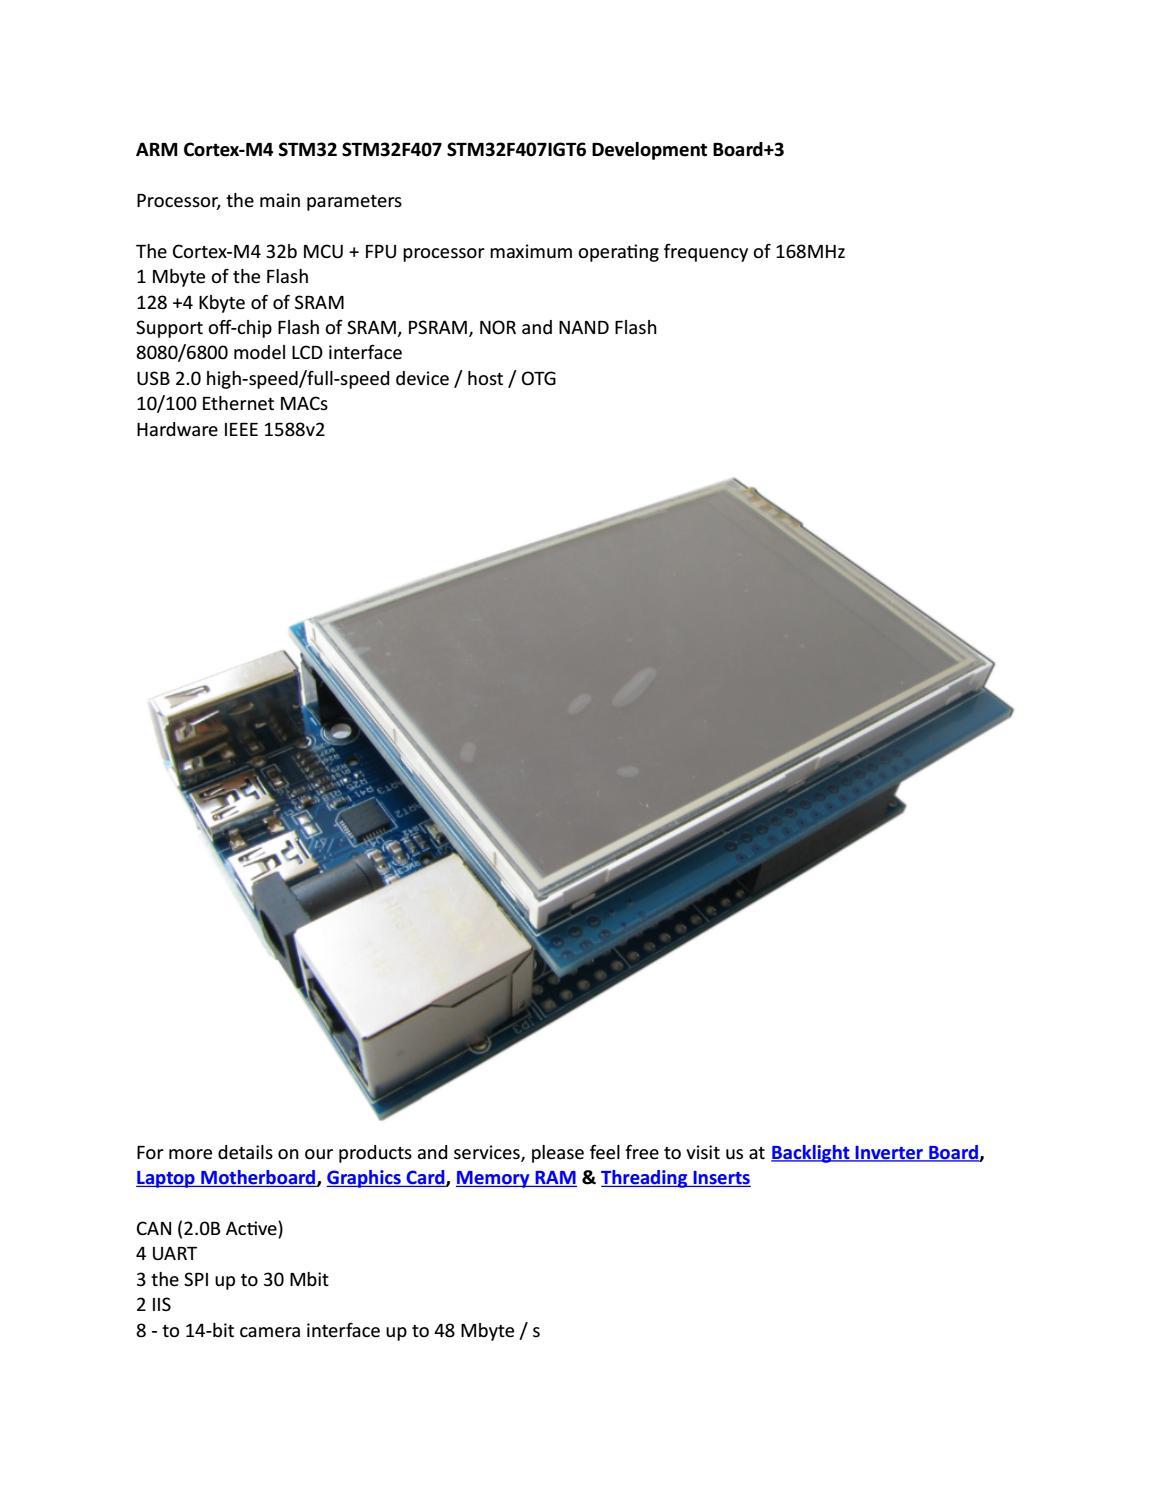 ARM Cortex-M4 STM32 STM32F407 STM32F407IGT6 Development